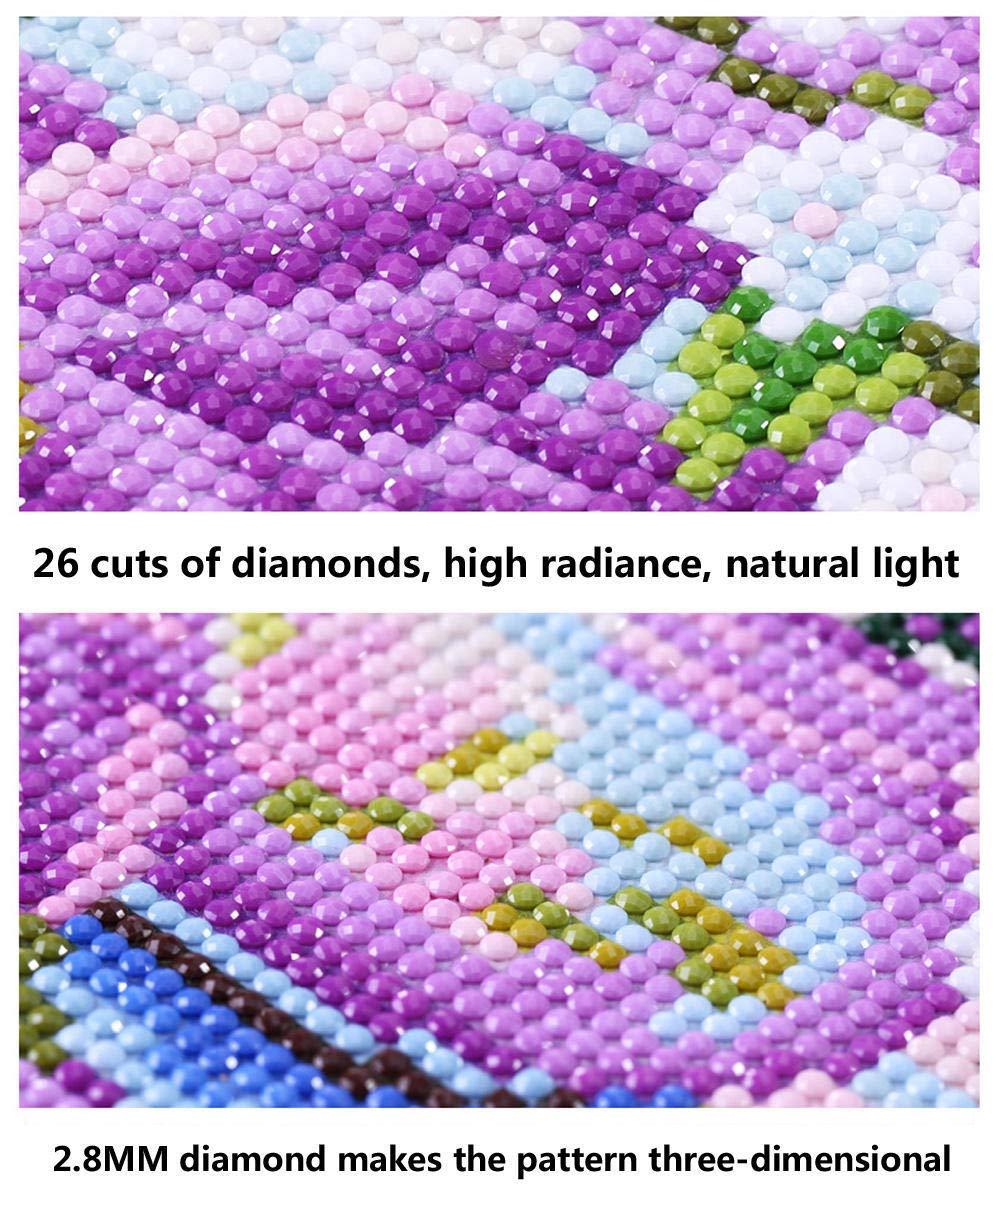 HUA5D Punto De Cruz Diamante Kit Completo 30X40Cm Diamante Pintura Mosaico Orangut/án Diamante Rhinestone Bordado Punto De Cruz Regalo